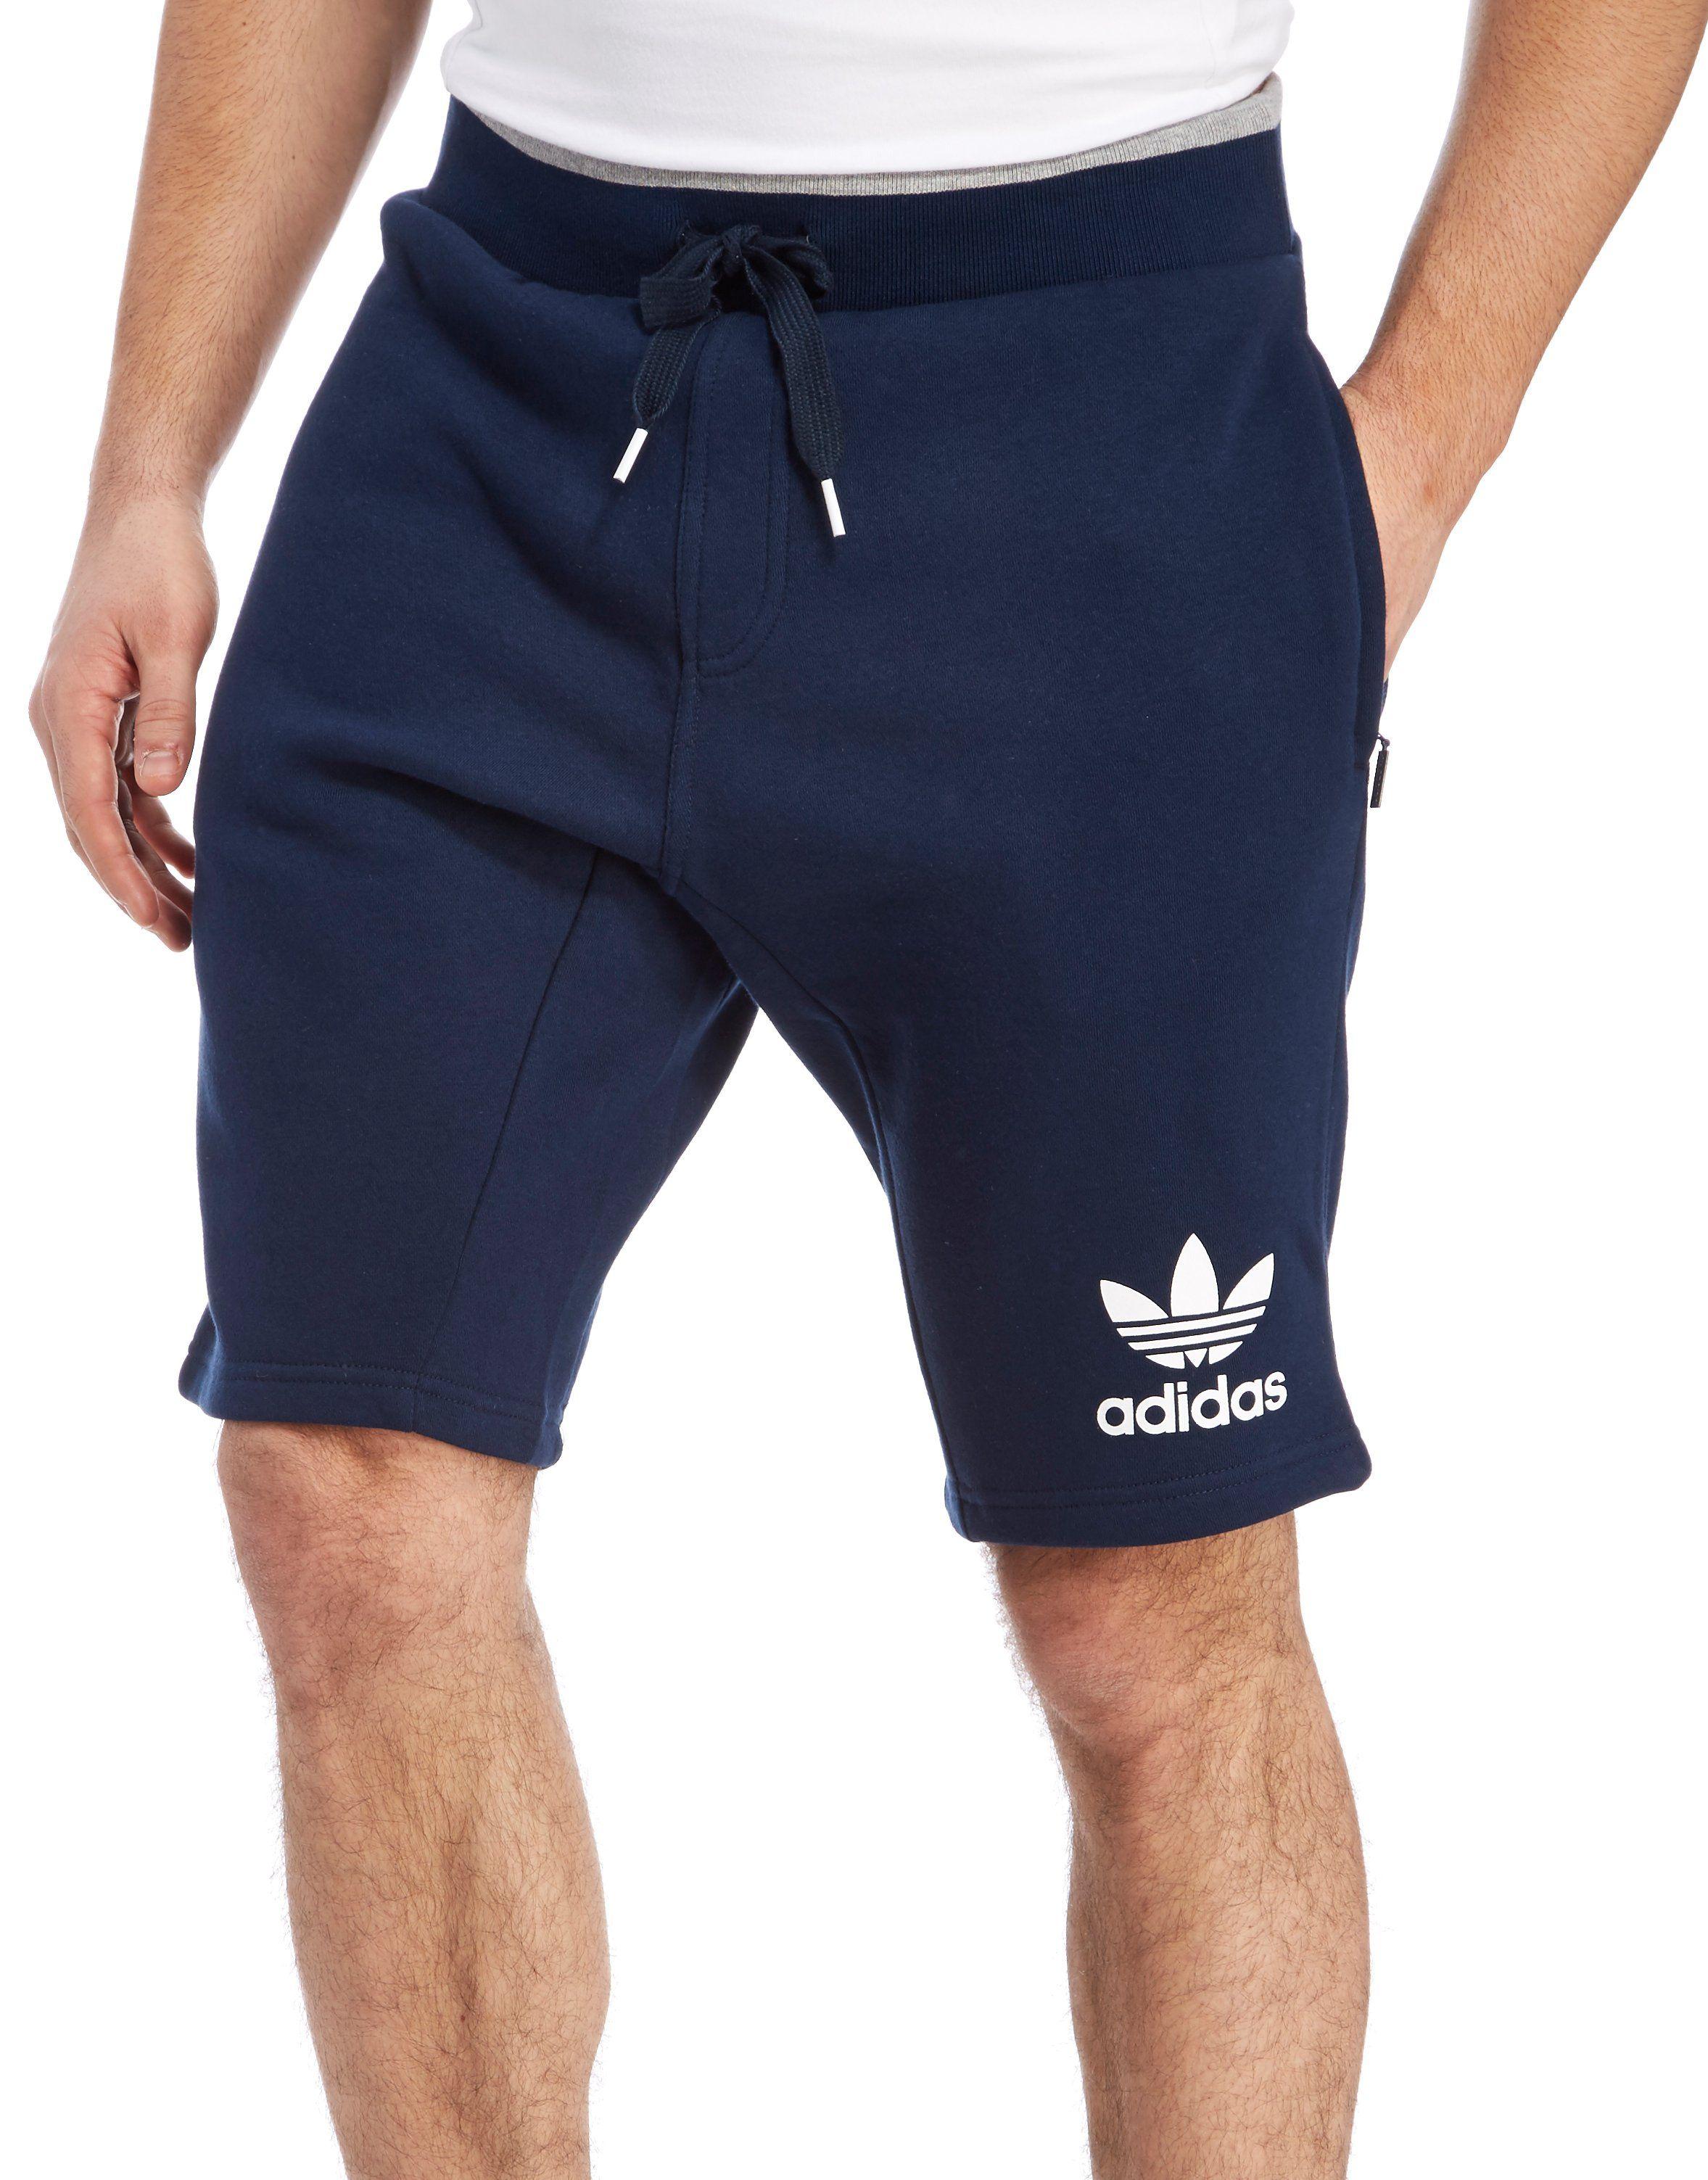 adidas trefoil shorts